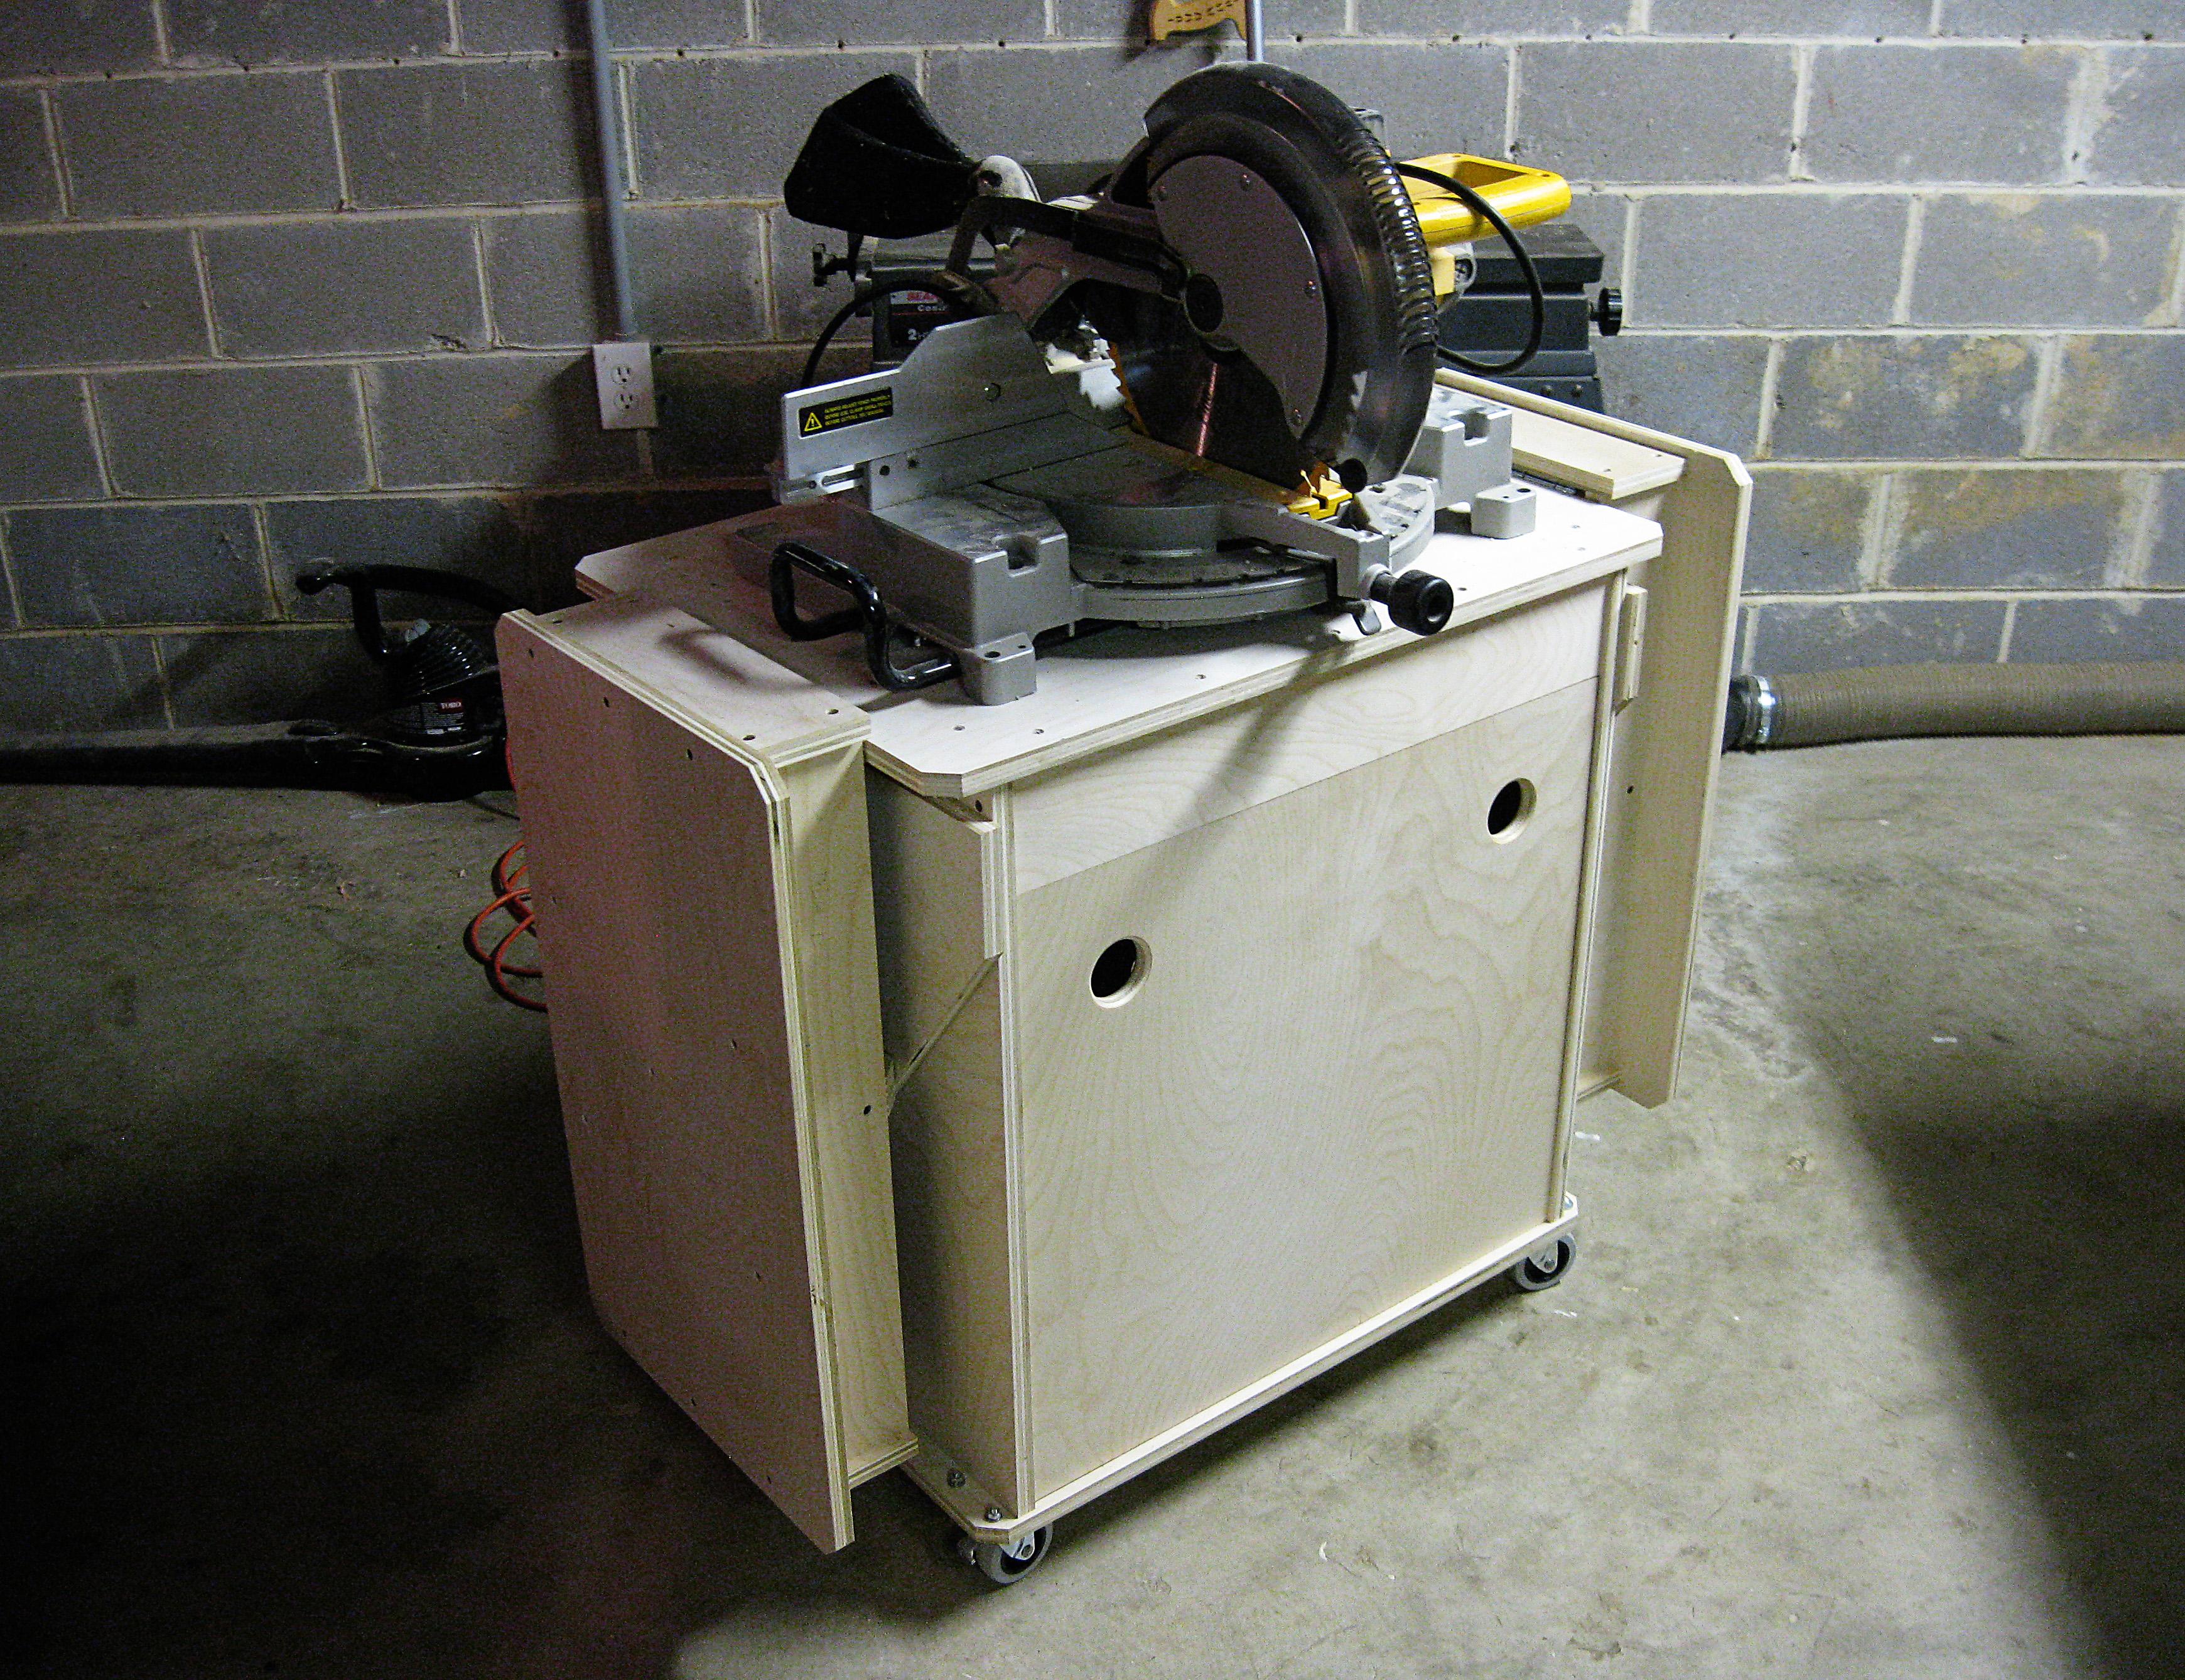 Build Portable Miter Saw Stand Plans Diy Pdf Cabin Plans Under 1000 Sq Ft Nondescript64alj